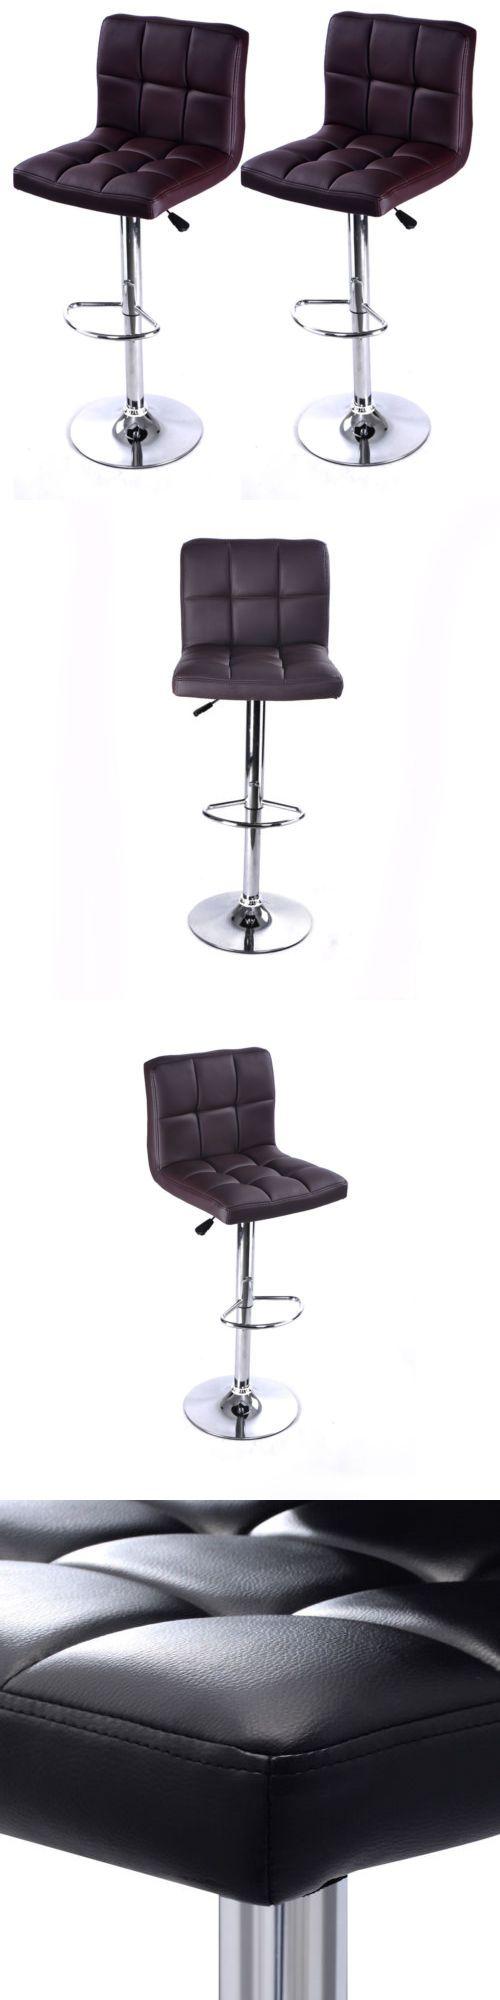 Bar Stools 153928: Set Of 2 Adjustable Bar Stools Pu Leather Barstools Swivel Pub Chairs Black New -> BUY IT NOW ONLY: $60.59 on eBay!